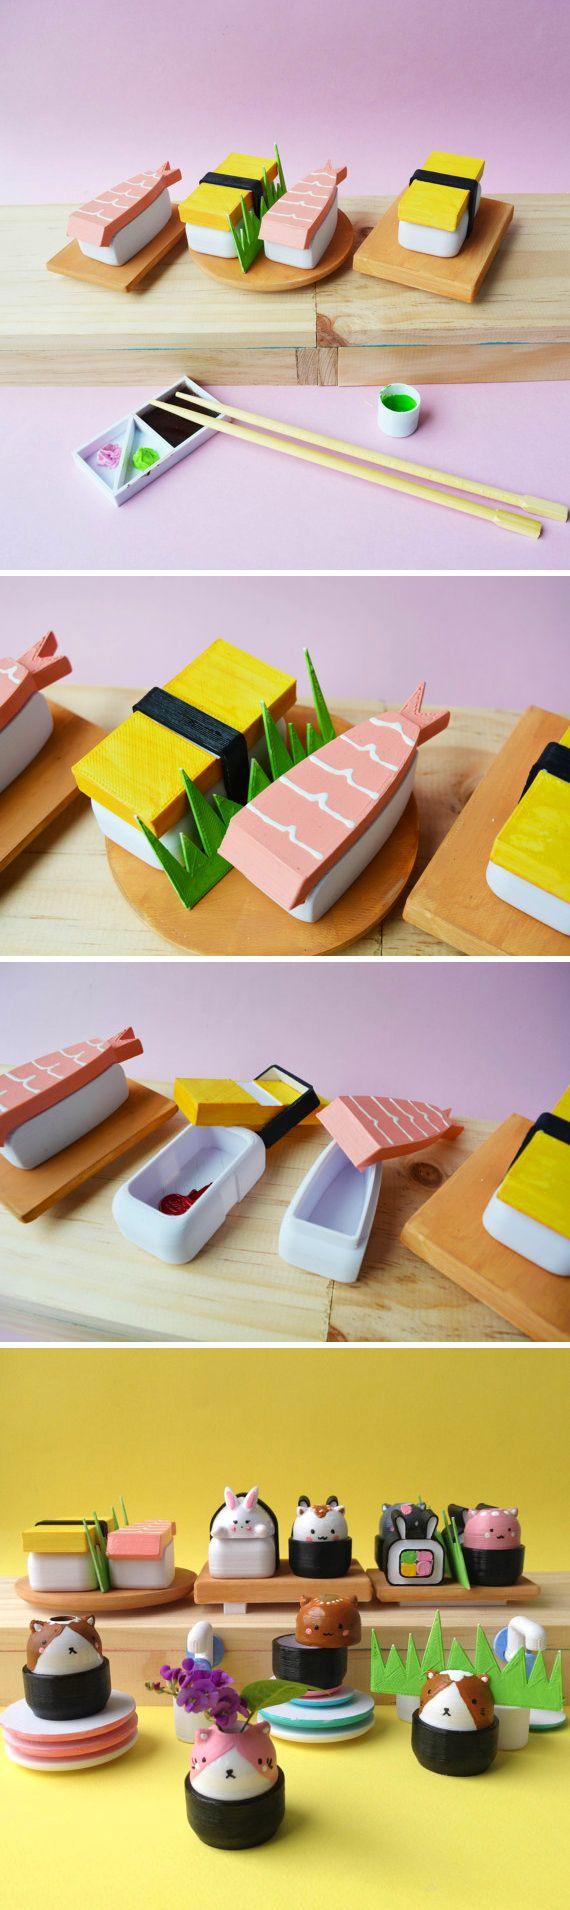 Japanese Bento Set - Handpainted sushi figurine miniature - small container -trinket box - 3d printed - tamago - shrimp